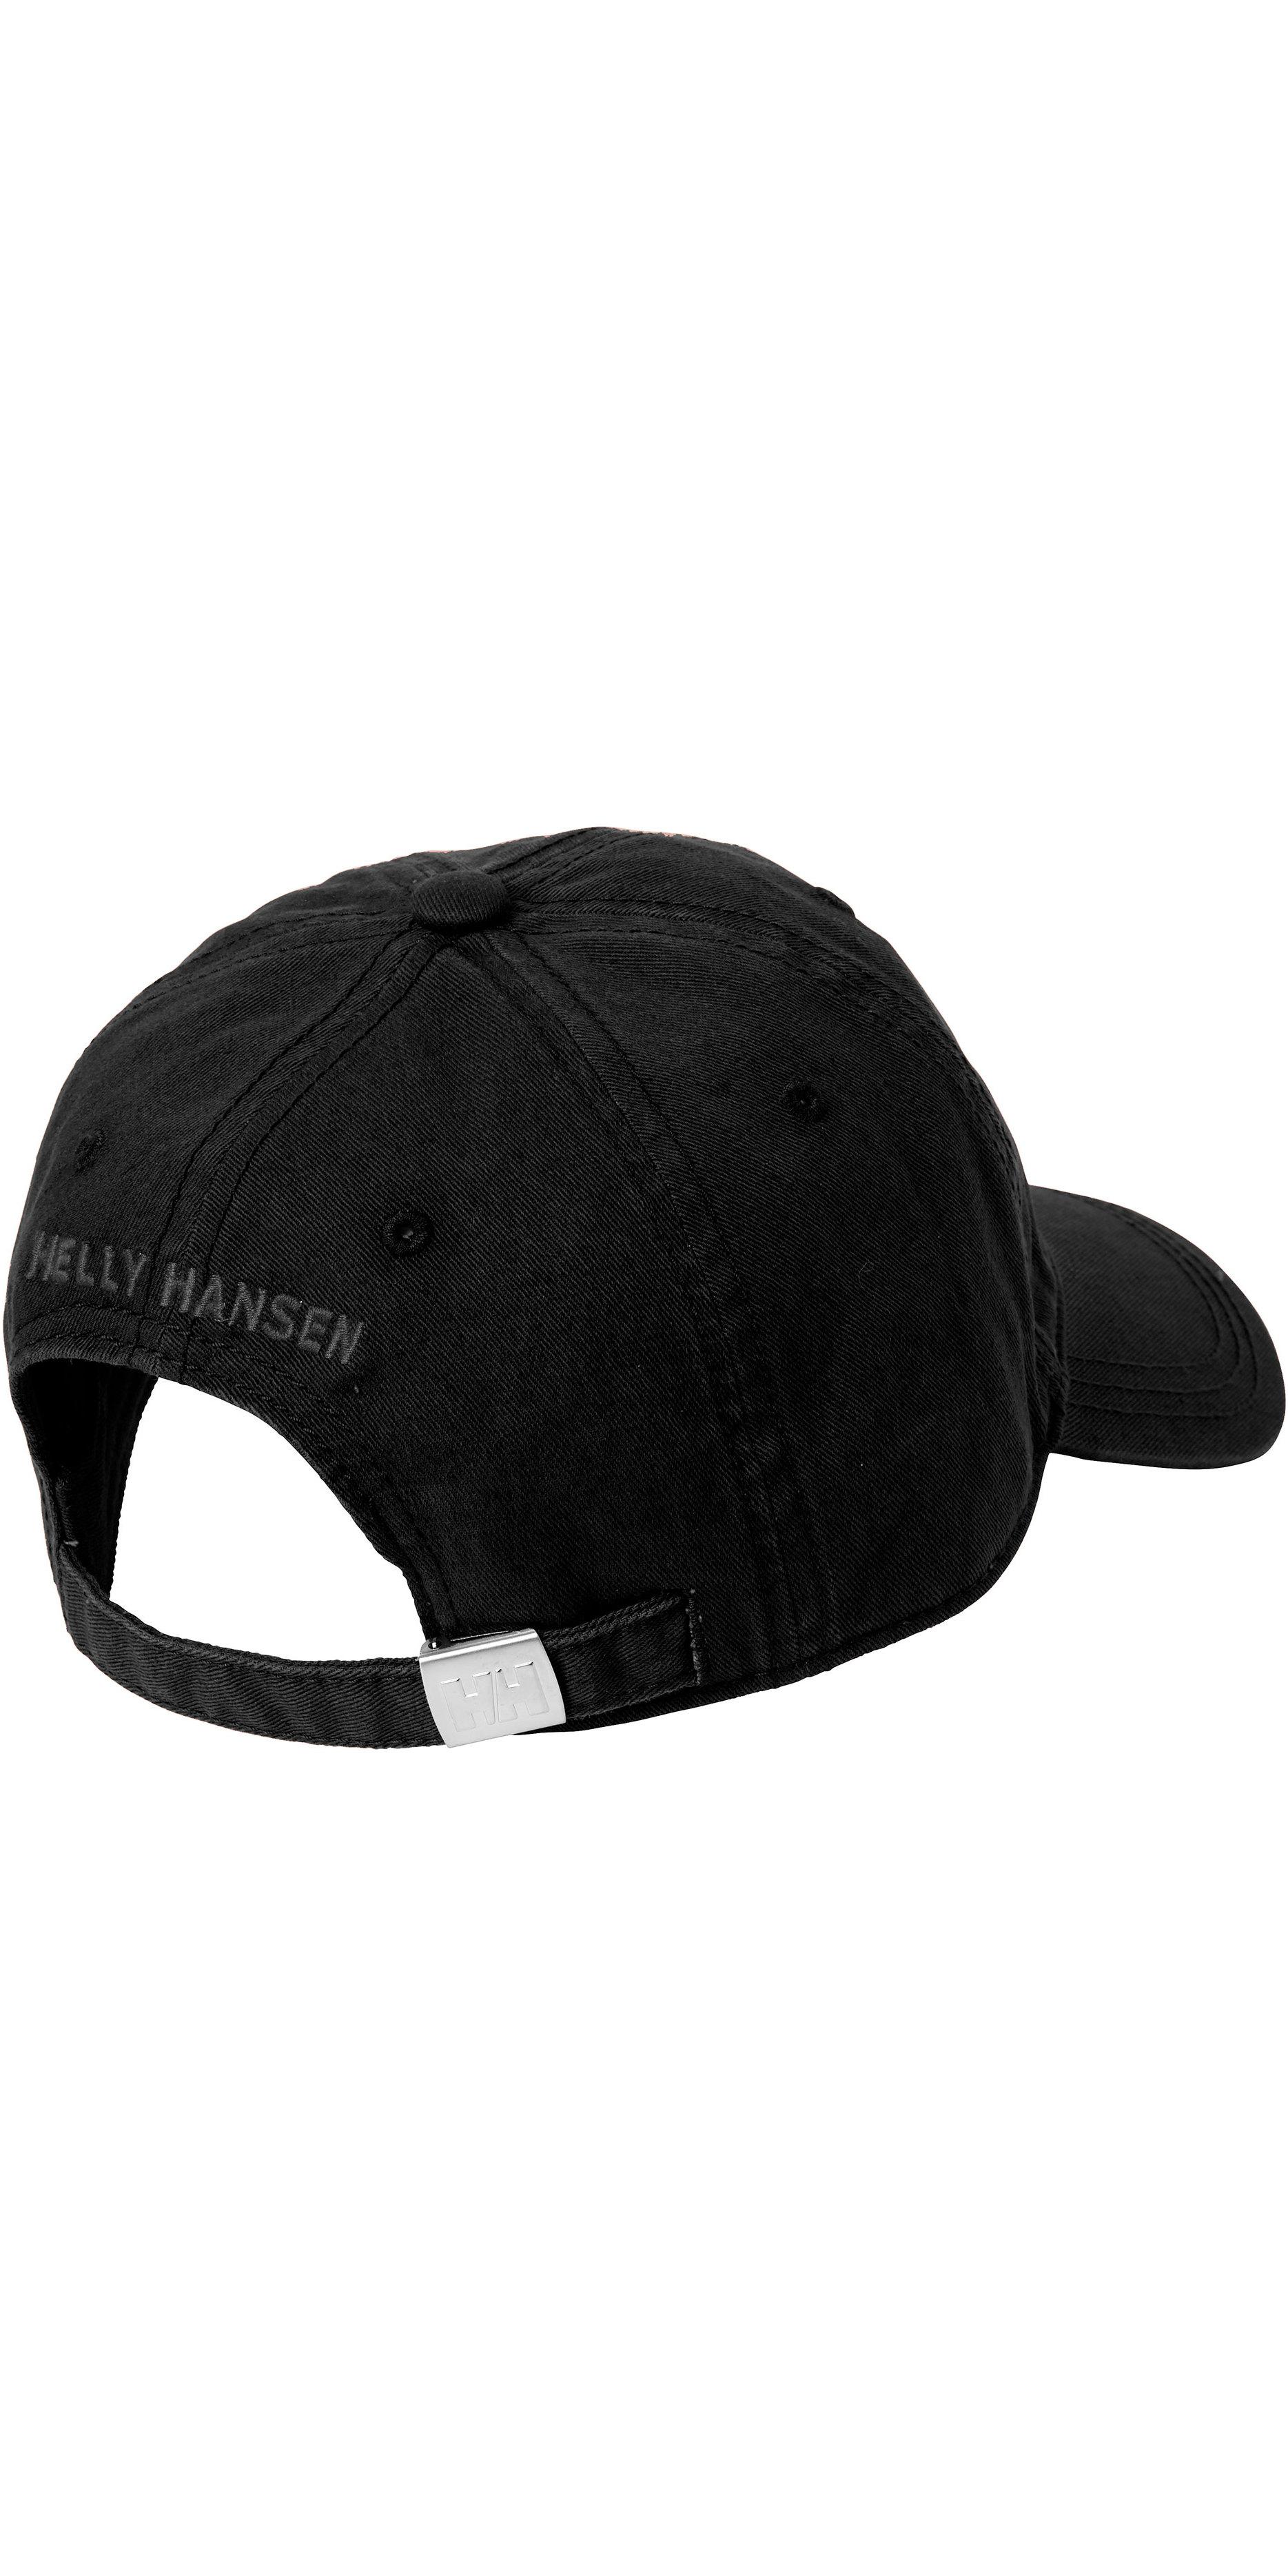 2019 Helly Hansen Logo Cap Black 38791